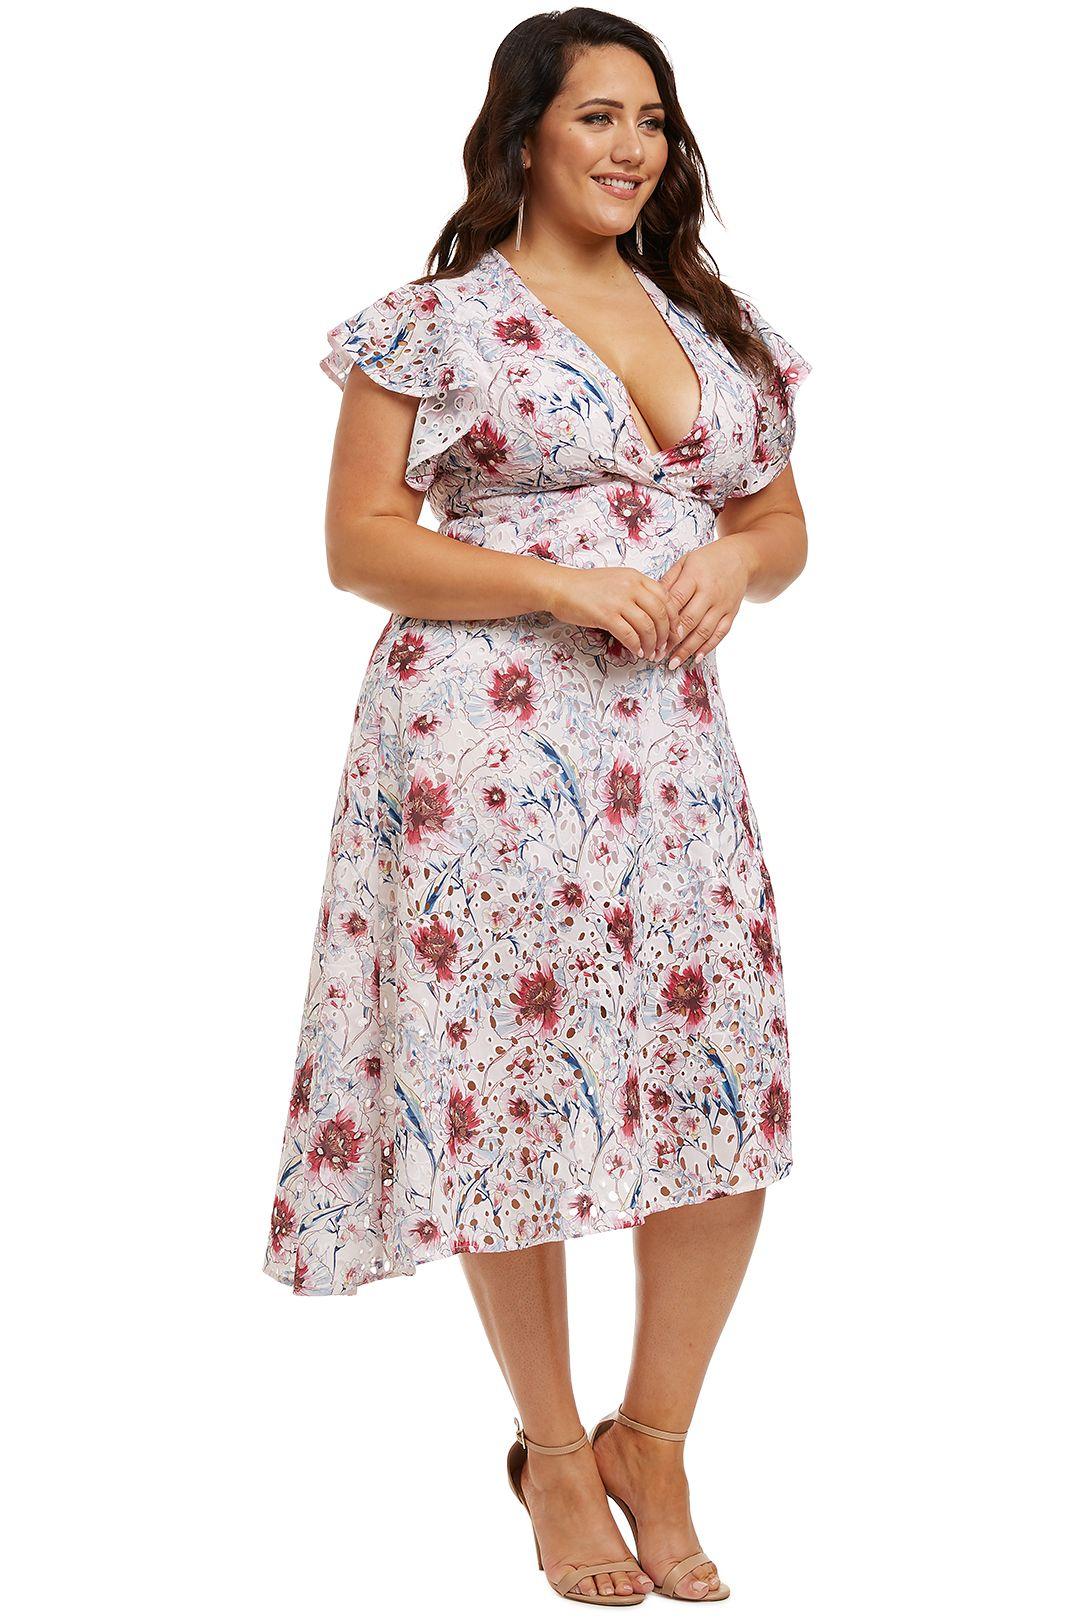 Talulah-Bonita-Midi-Dress-Casablanca-Print-Side